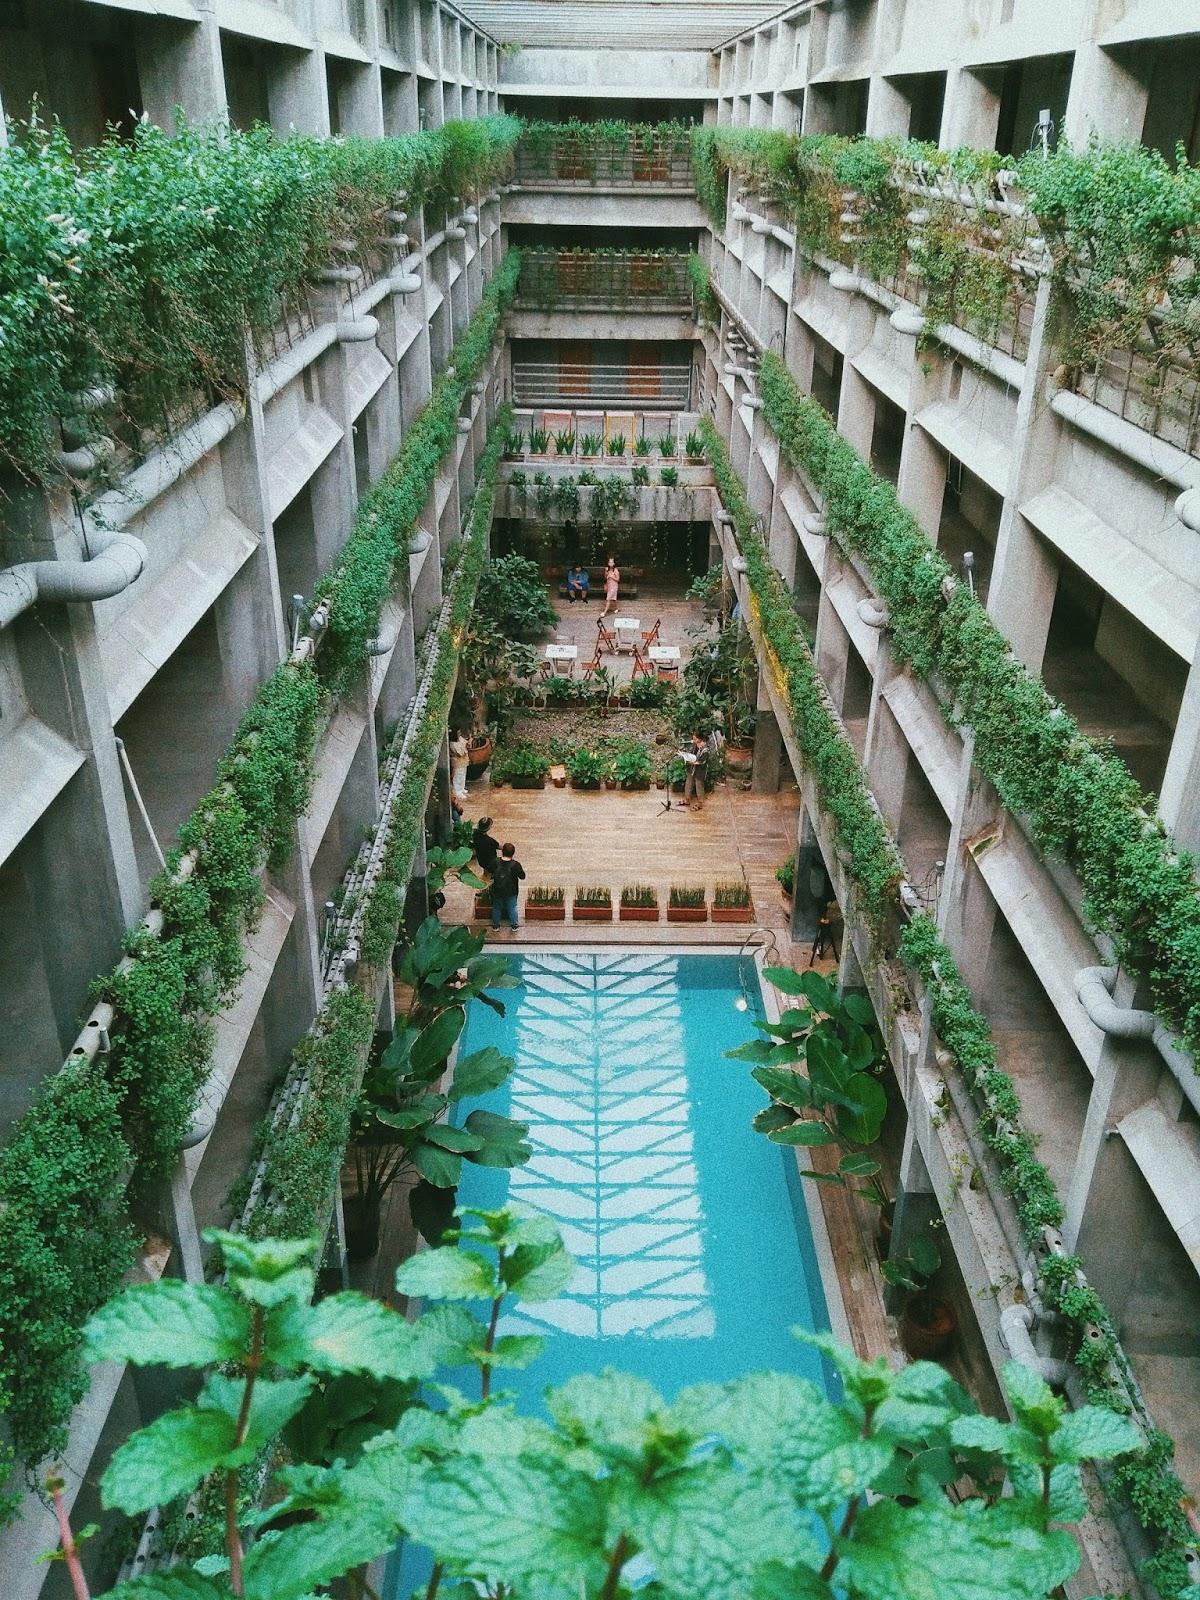 Menyusuri Prawirotaman Jogja : Hidup Ketika Pagi, Redup Kala Malam Menanti - Greenhost